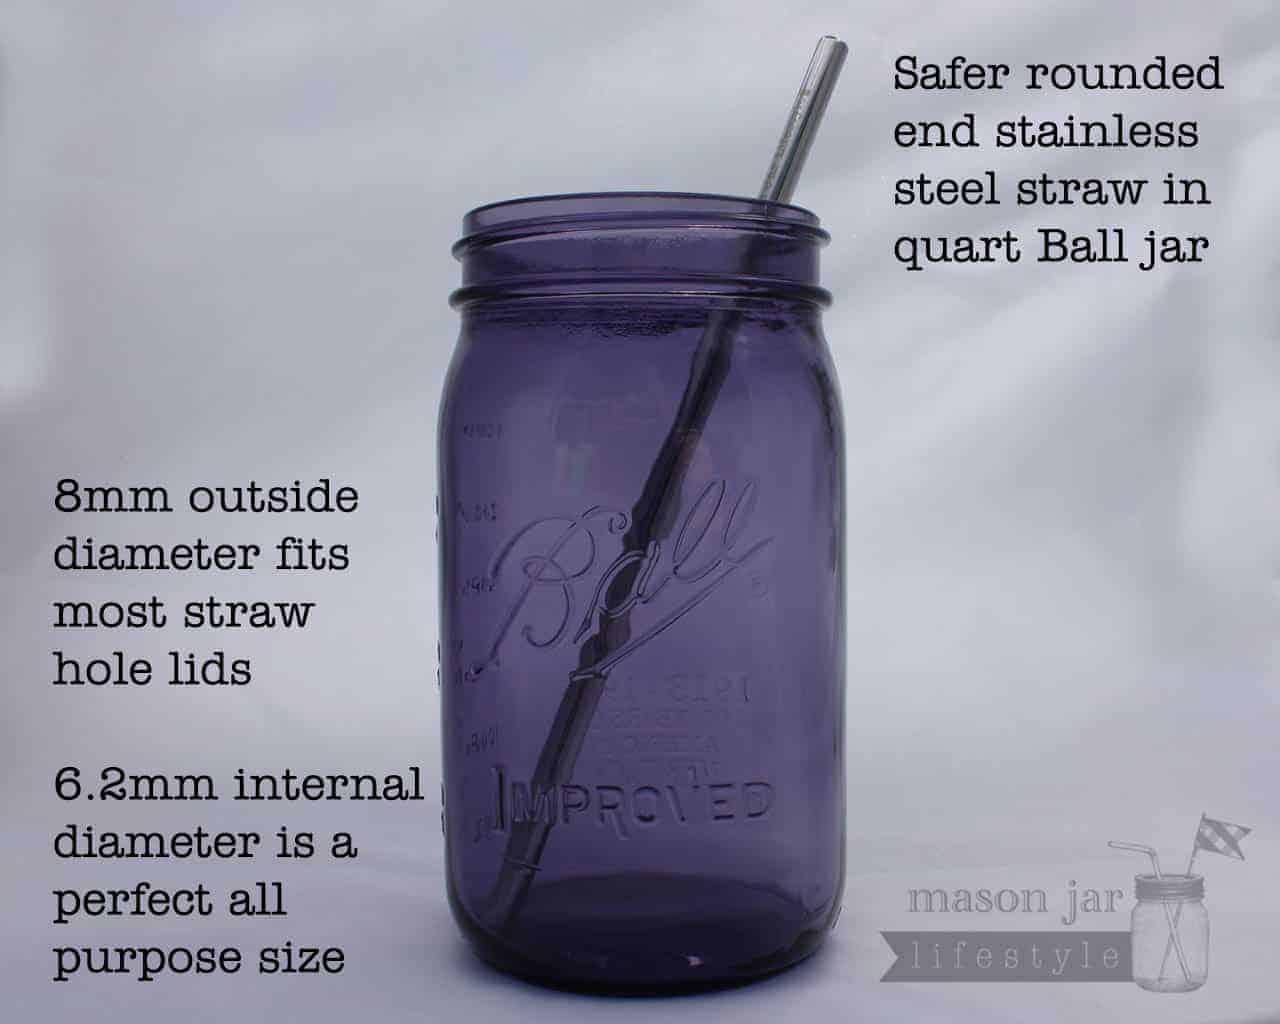 Summer Cocktails custom text mason jars | Zazzle.com  |Mason Jar Text